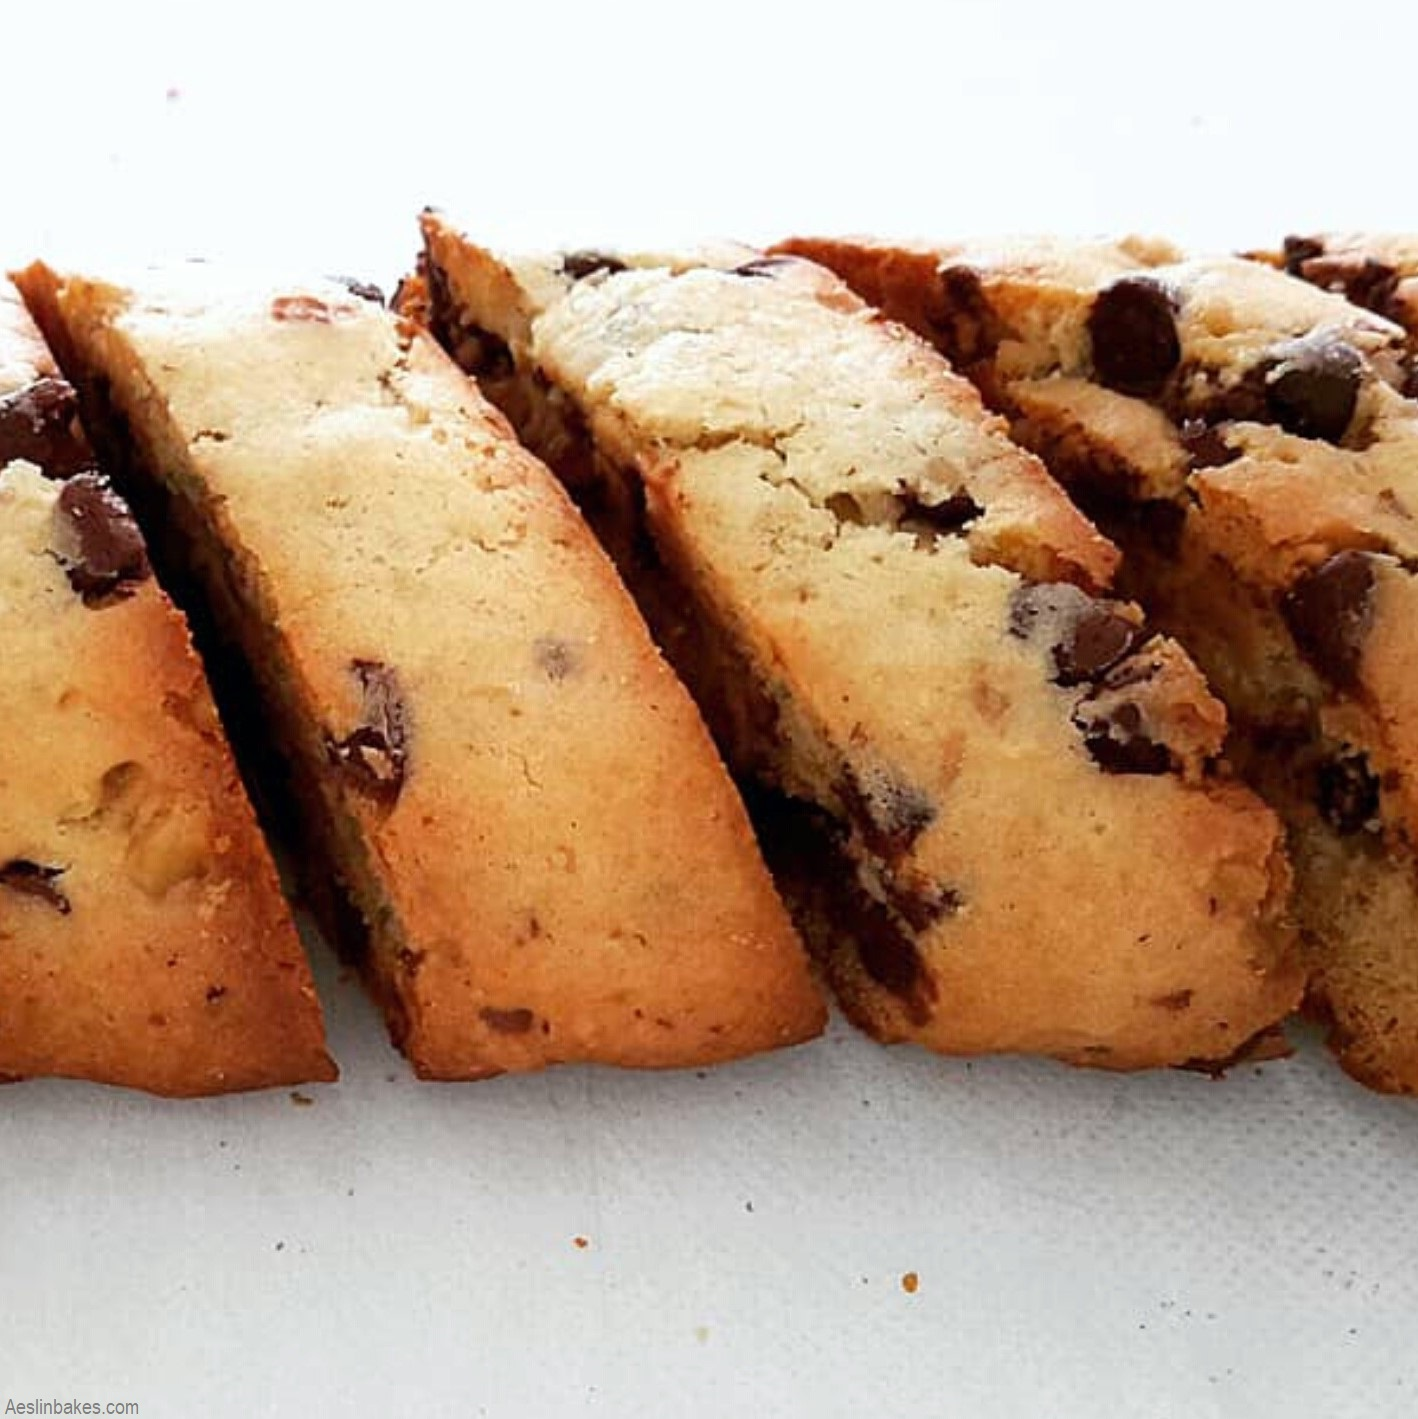 Chocolate Chip Walnut Biscotti evenly baked sq